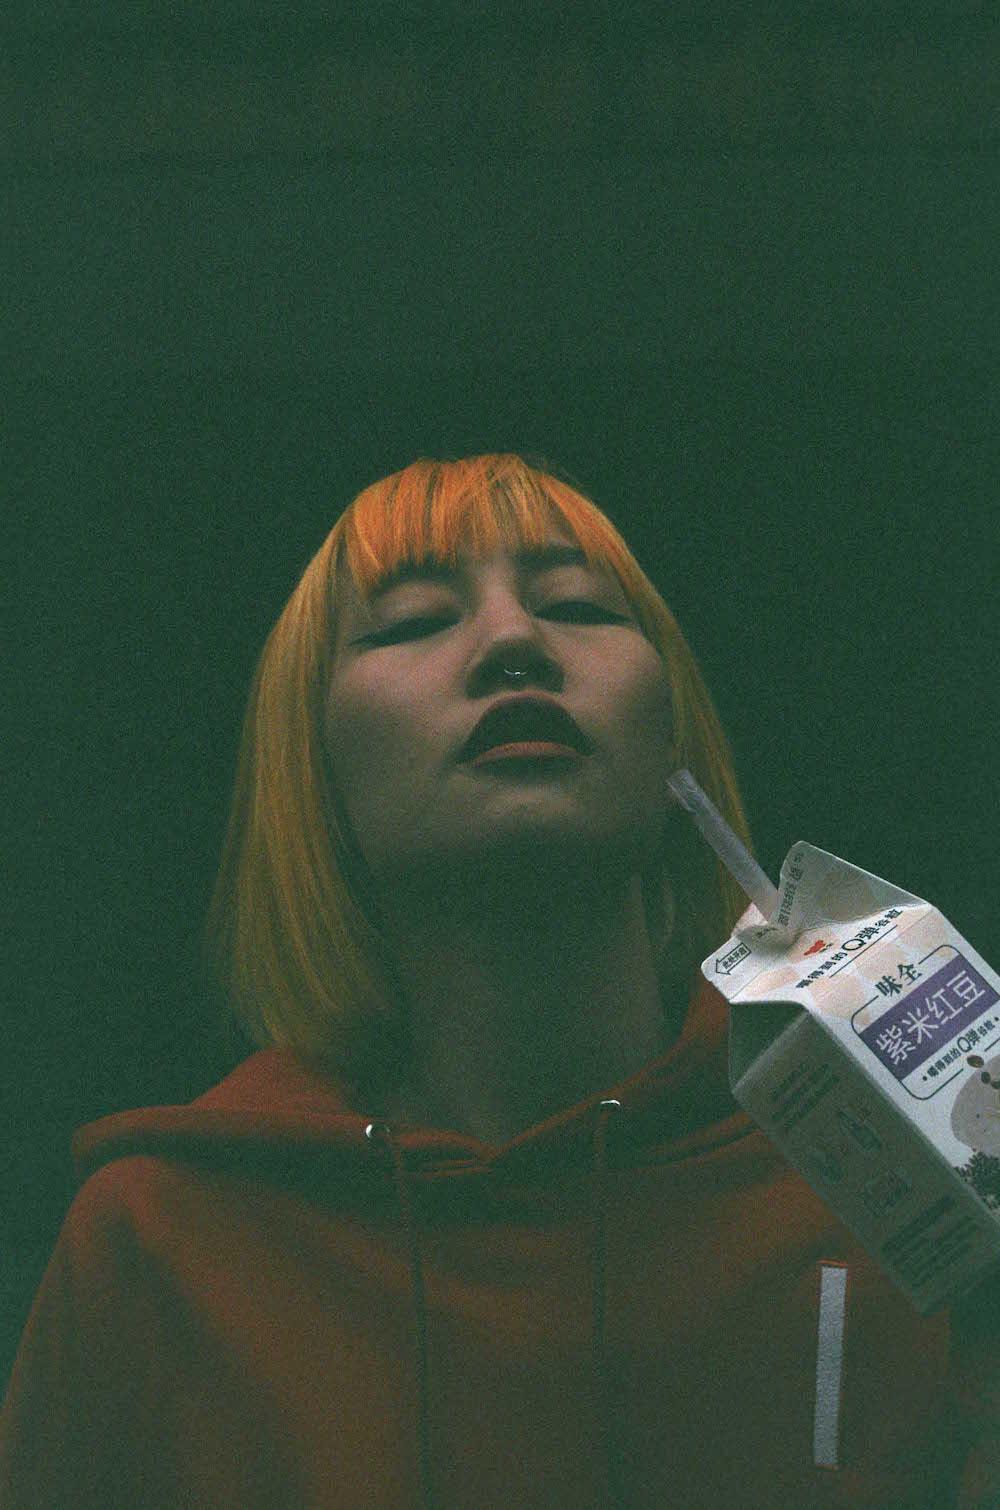 duran-levinson-shanghai-photography-3.jpg